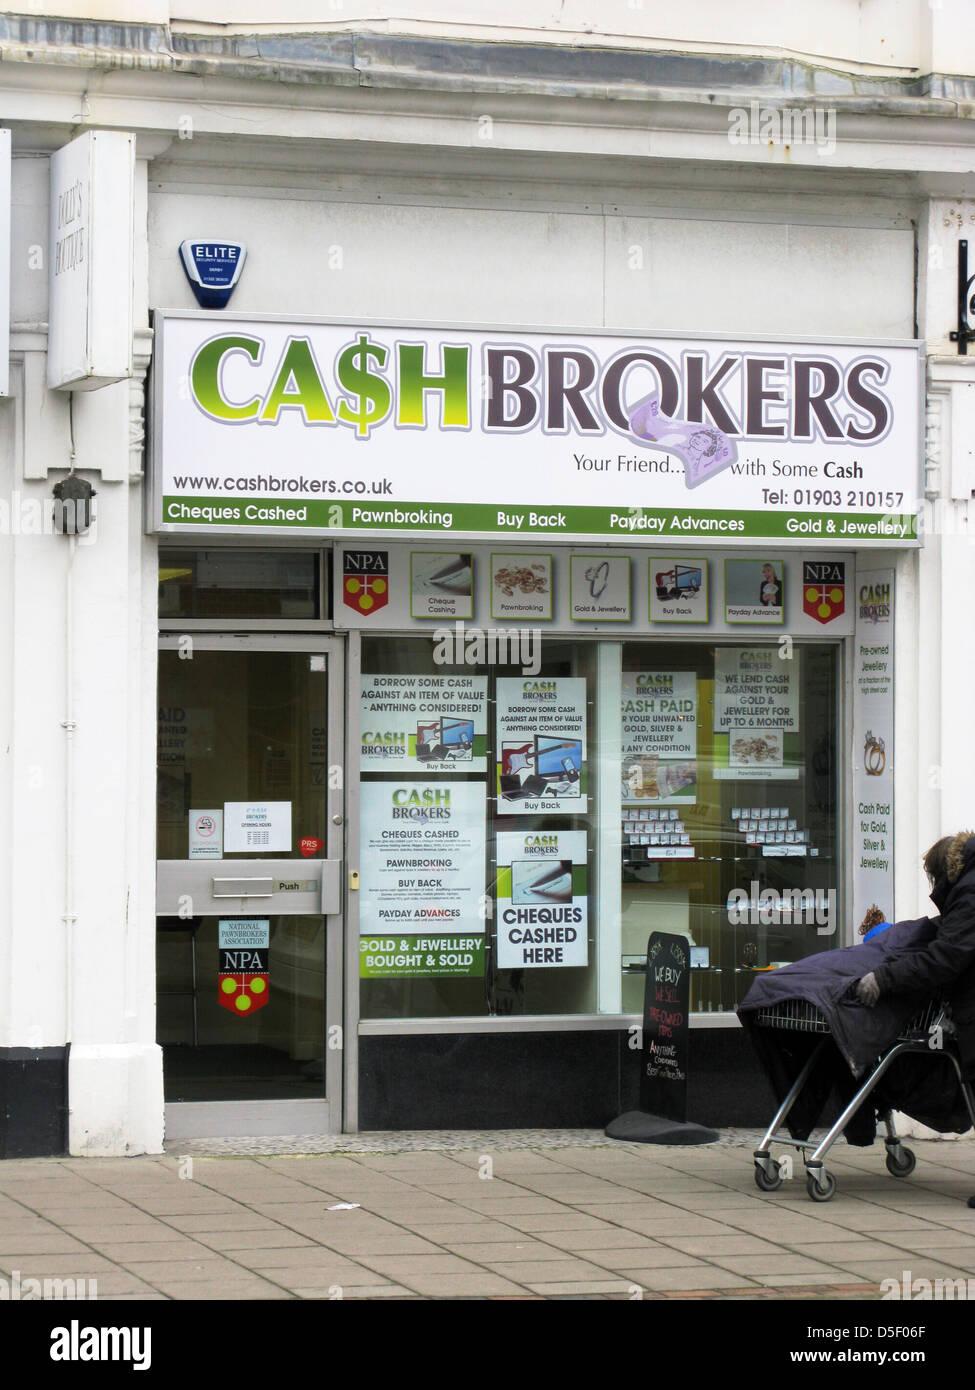 No guarantor loans image 9